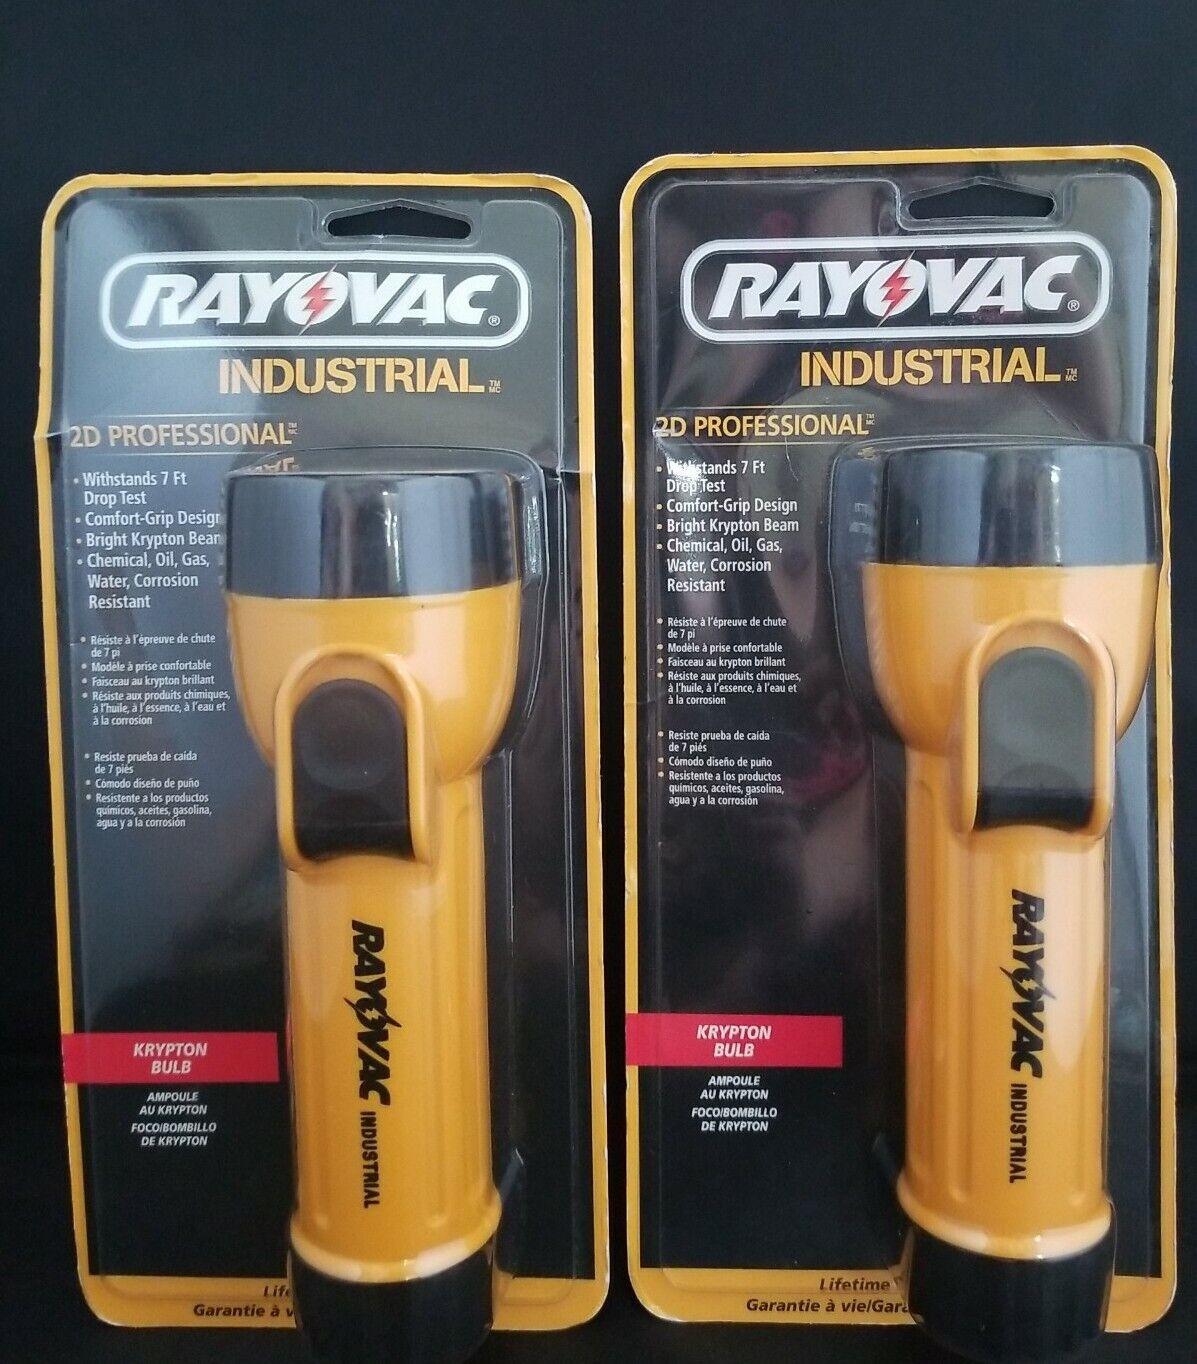 Rayovac industrial 2D Profesional linterna haz de alta intensidad-Lote de 2